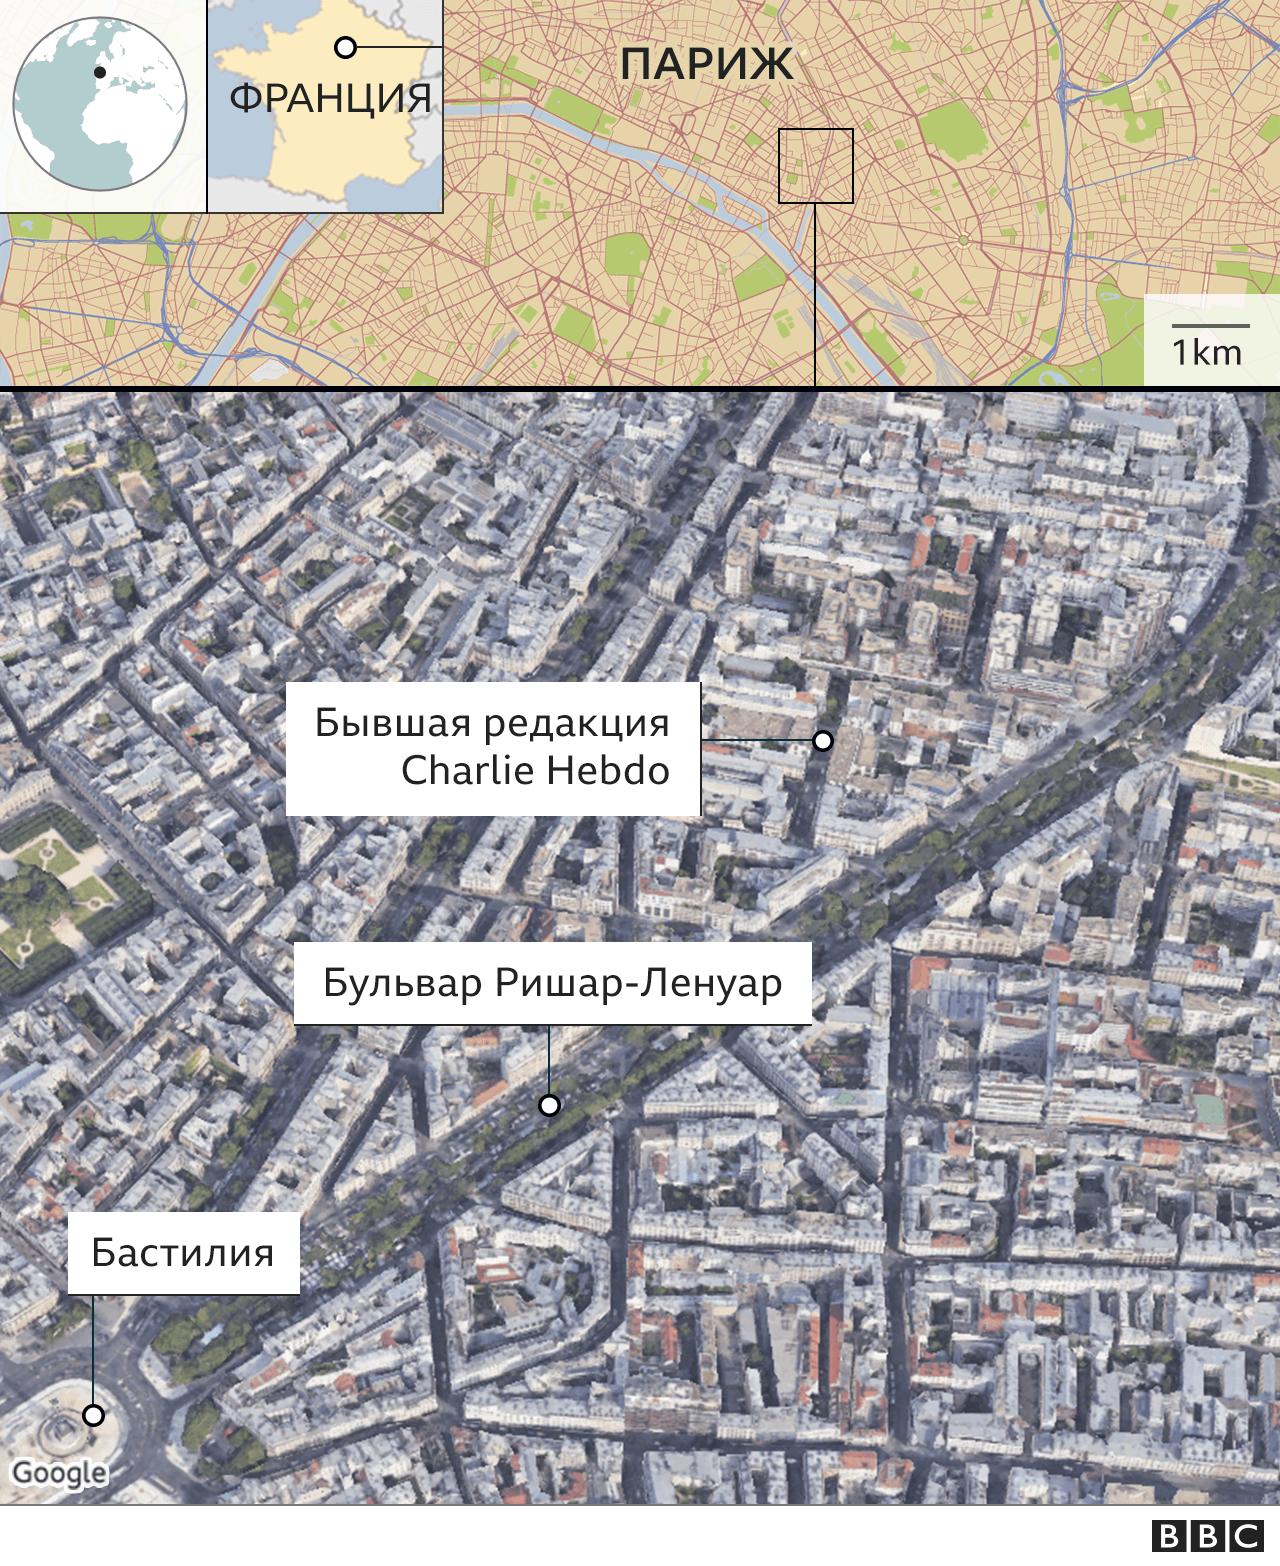 Карта места нападения в Париже